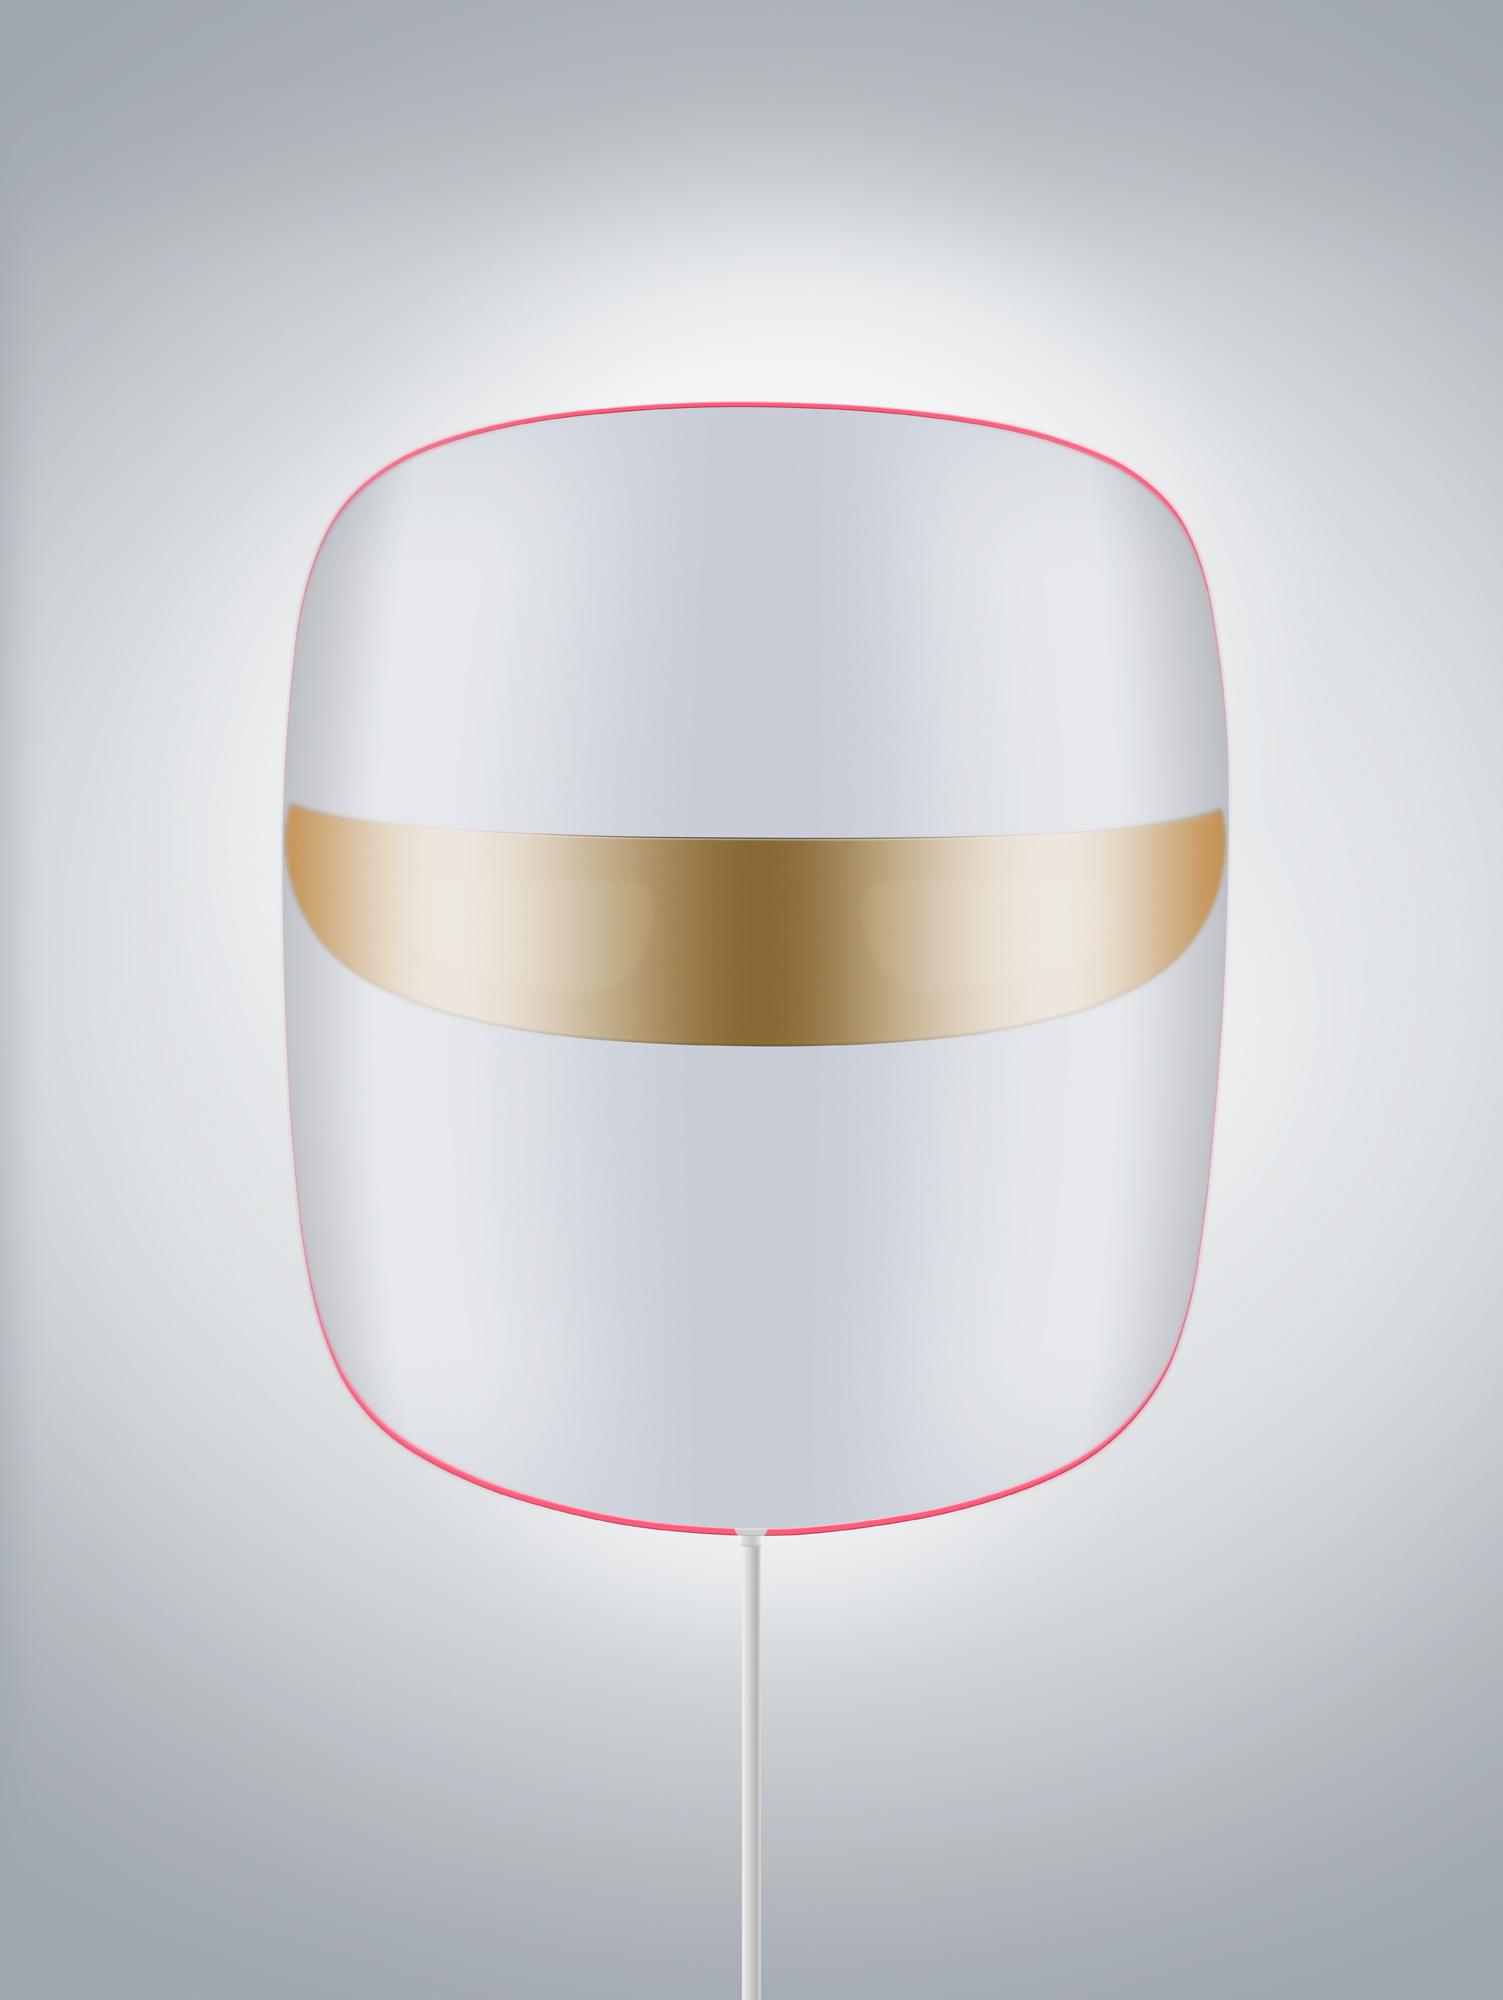 Mặt nạ ánh sáng LG Pra.L Derma LED BWJ2